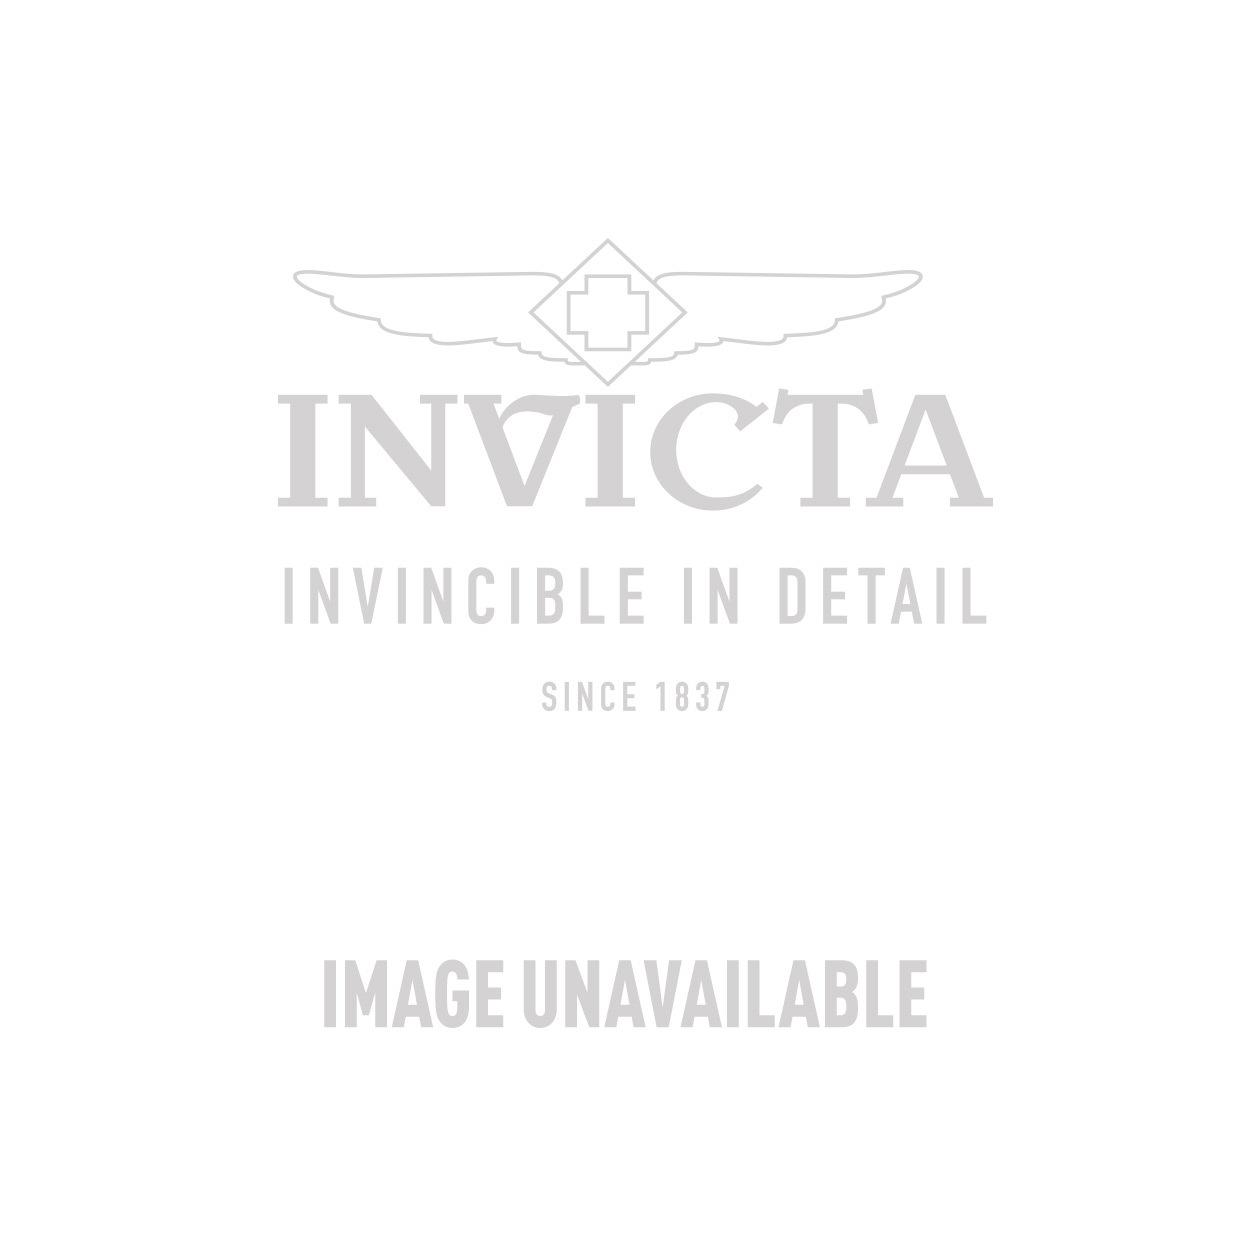 Invicta Speedway Quartz Watch - Gold, Black case with Gold, Black tone Stainless Steel, Polyurethane band - Model 17200